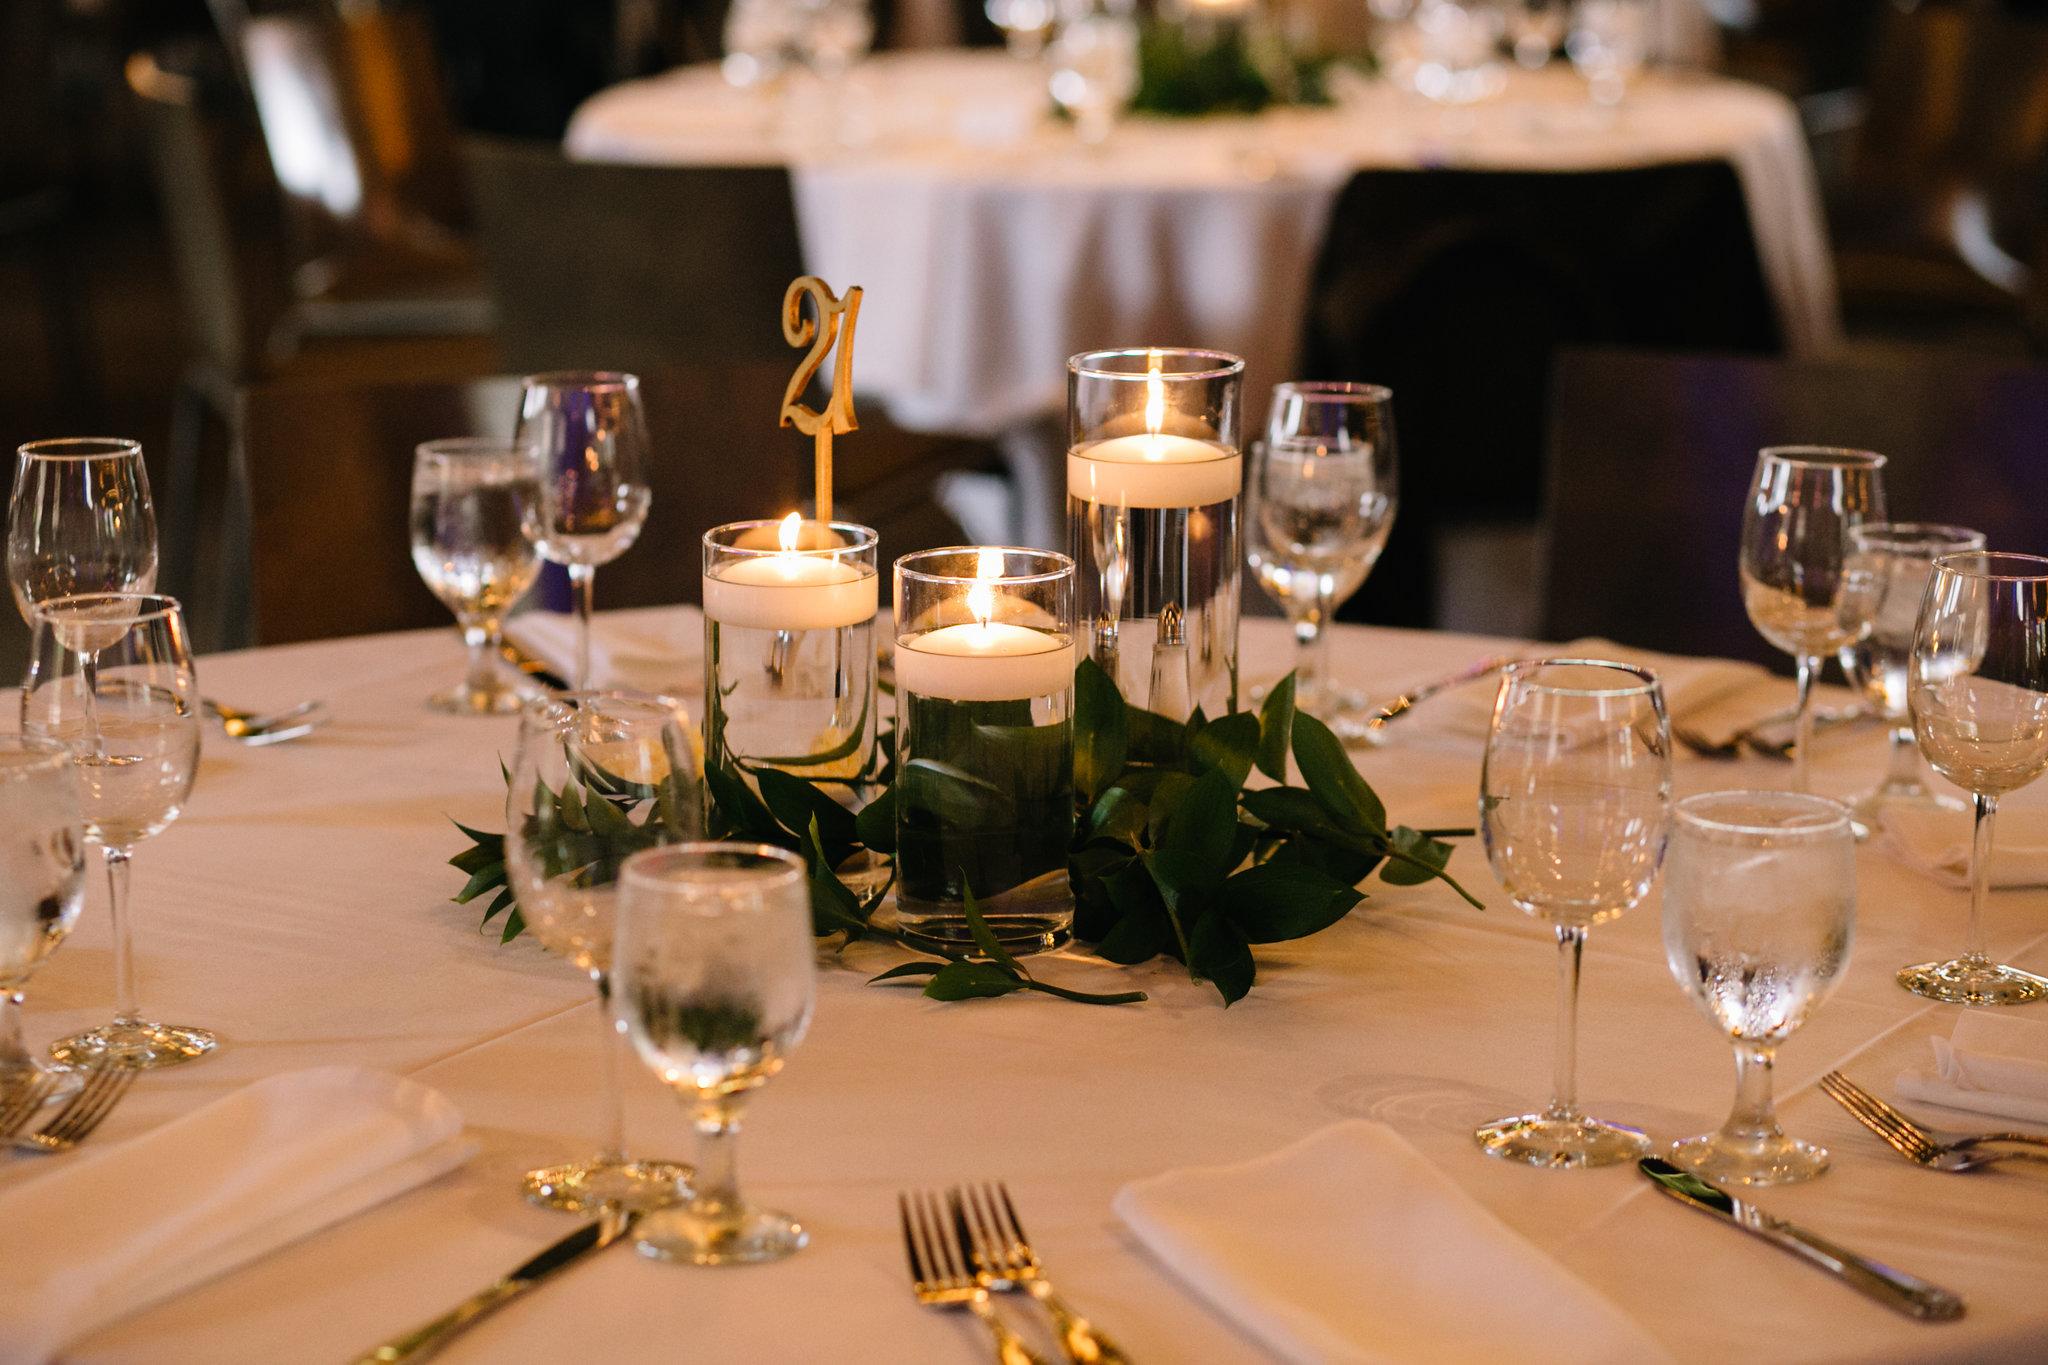 72 Whims and Joy Minneapolis photographer :: Sixpence Events & Planning Minnesota wedding planner :: Nicollet Island Pavilion.jpg